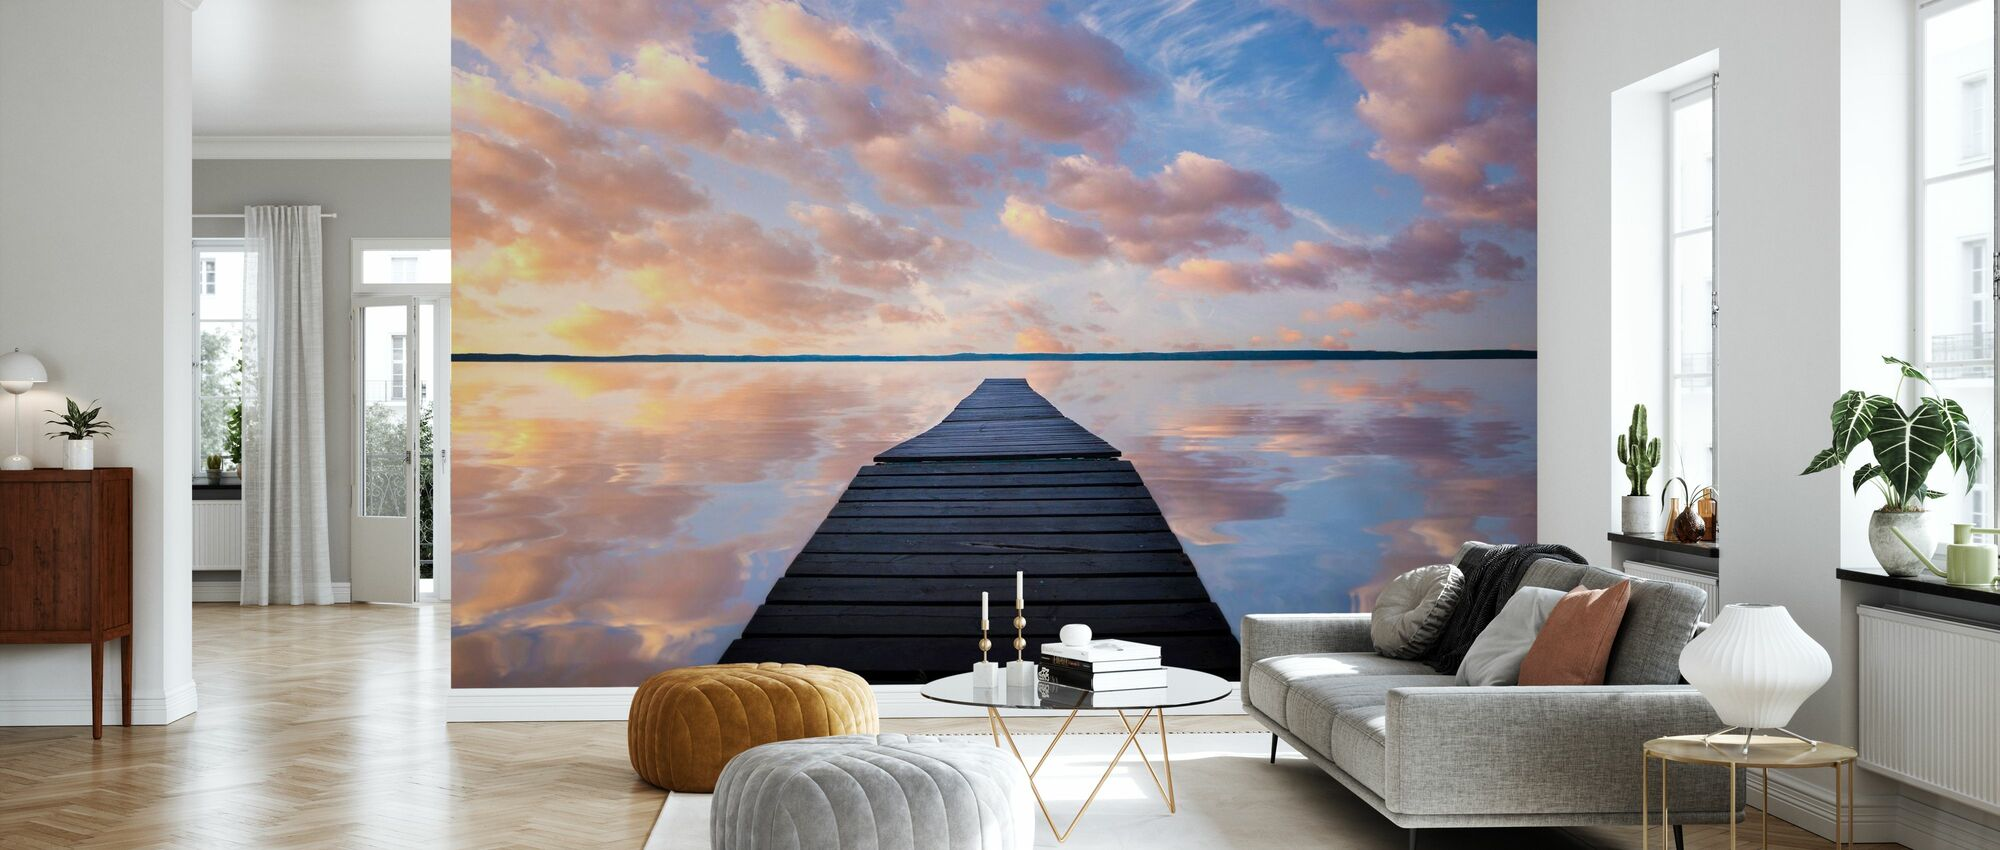 Sanctuary - Wallpaper - Living Room